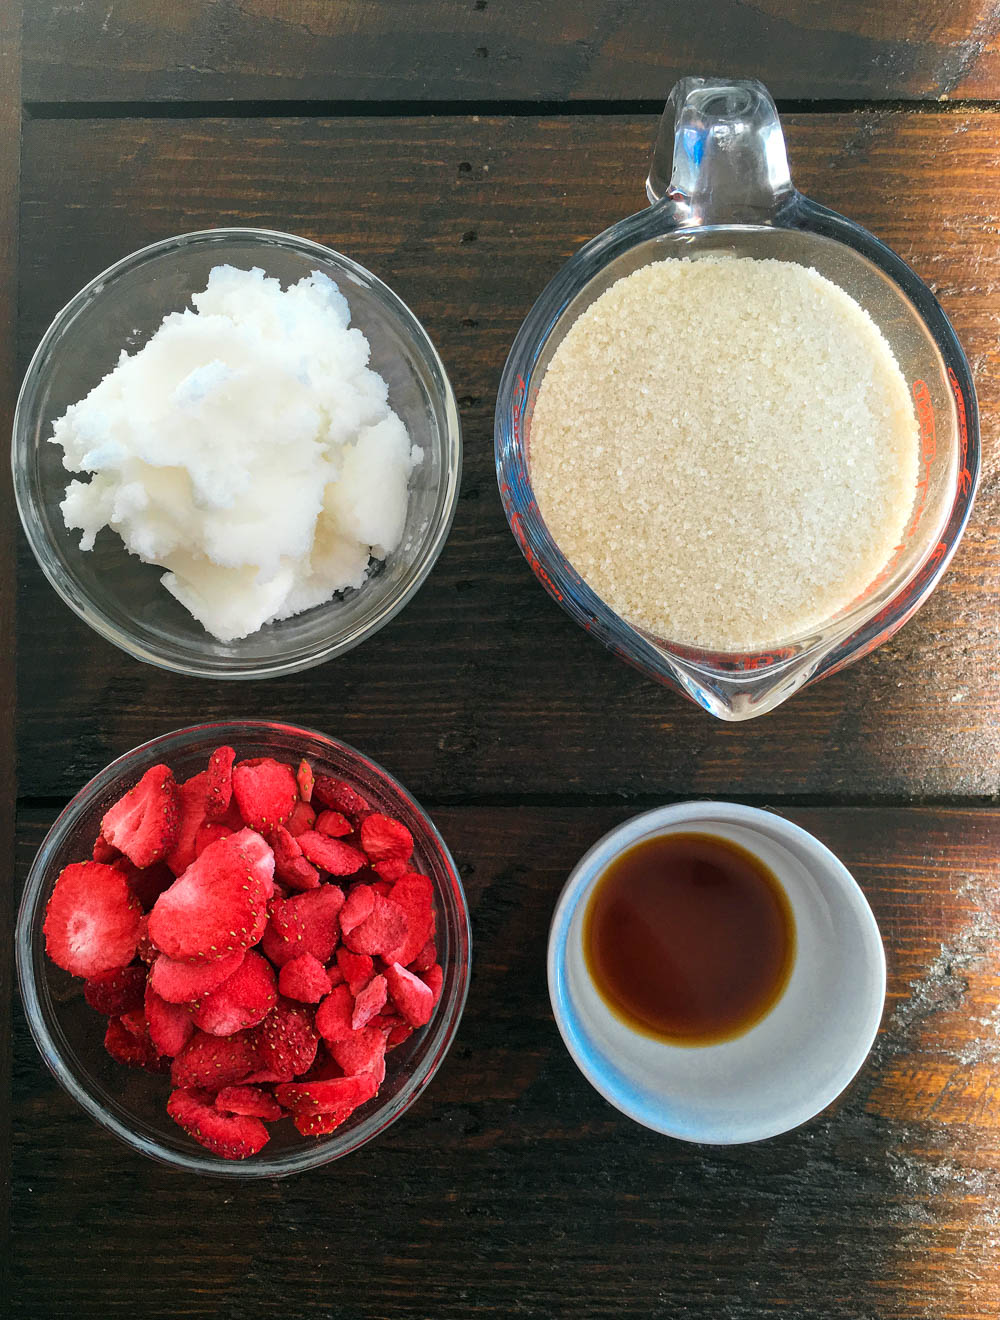 strawberry-scrub-7.jpg